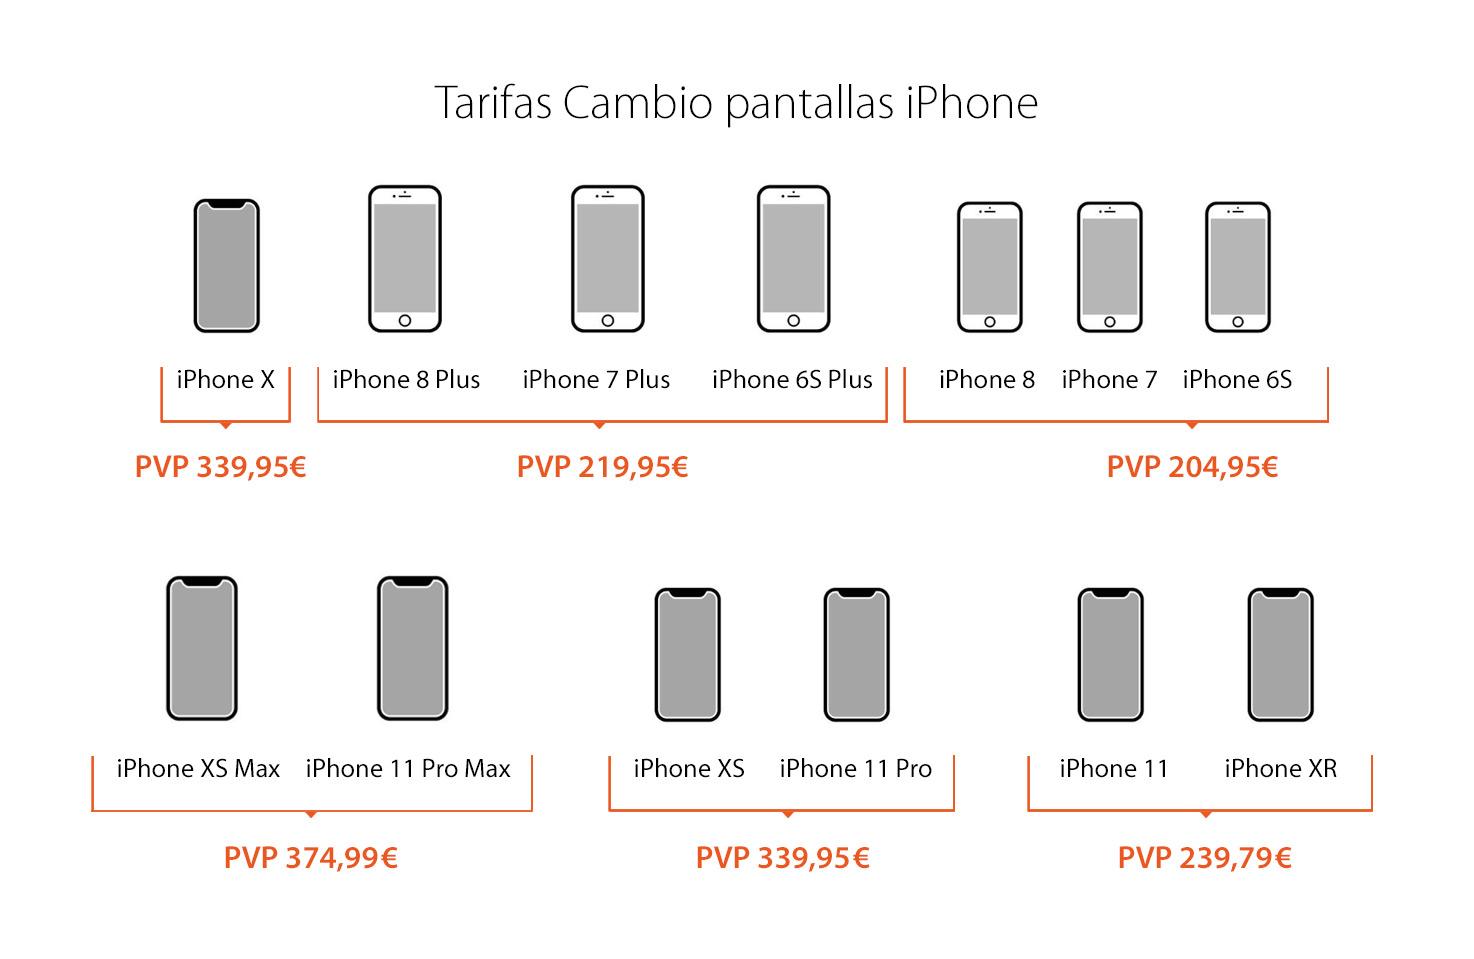 Precios cambio pantalla iPhone SAT OK